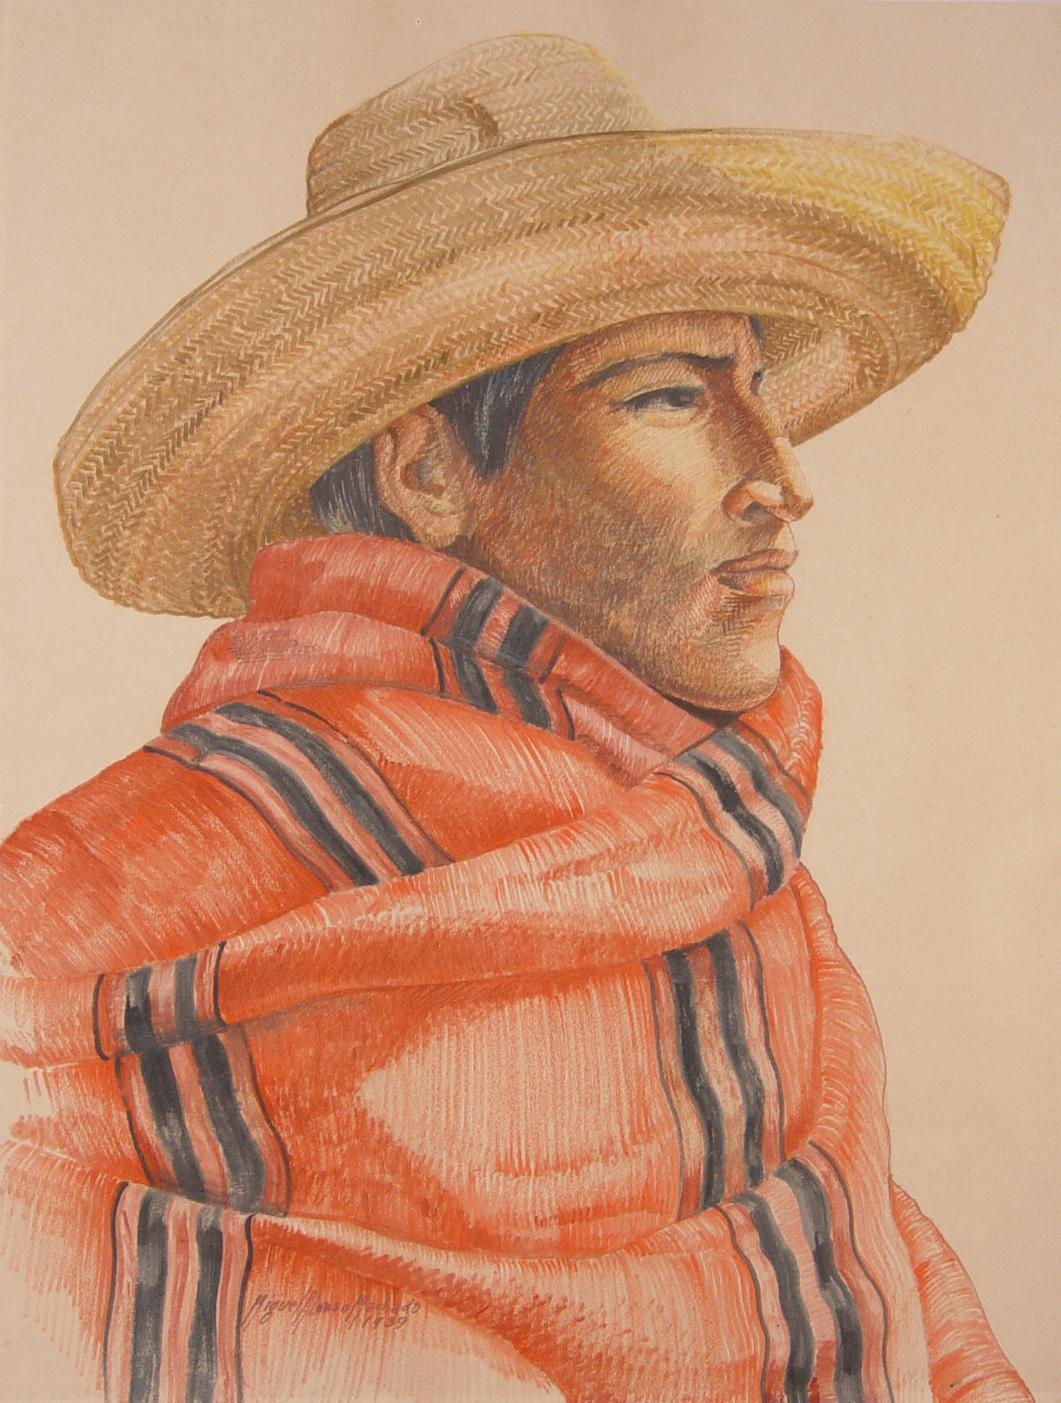 mexiko indio azteken maya indianer poncho sombrero hut ebay. Black Bedroom Furniture Sets. Home Design Ideas